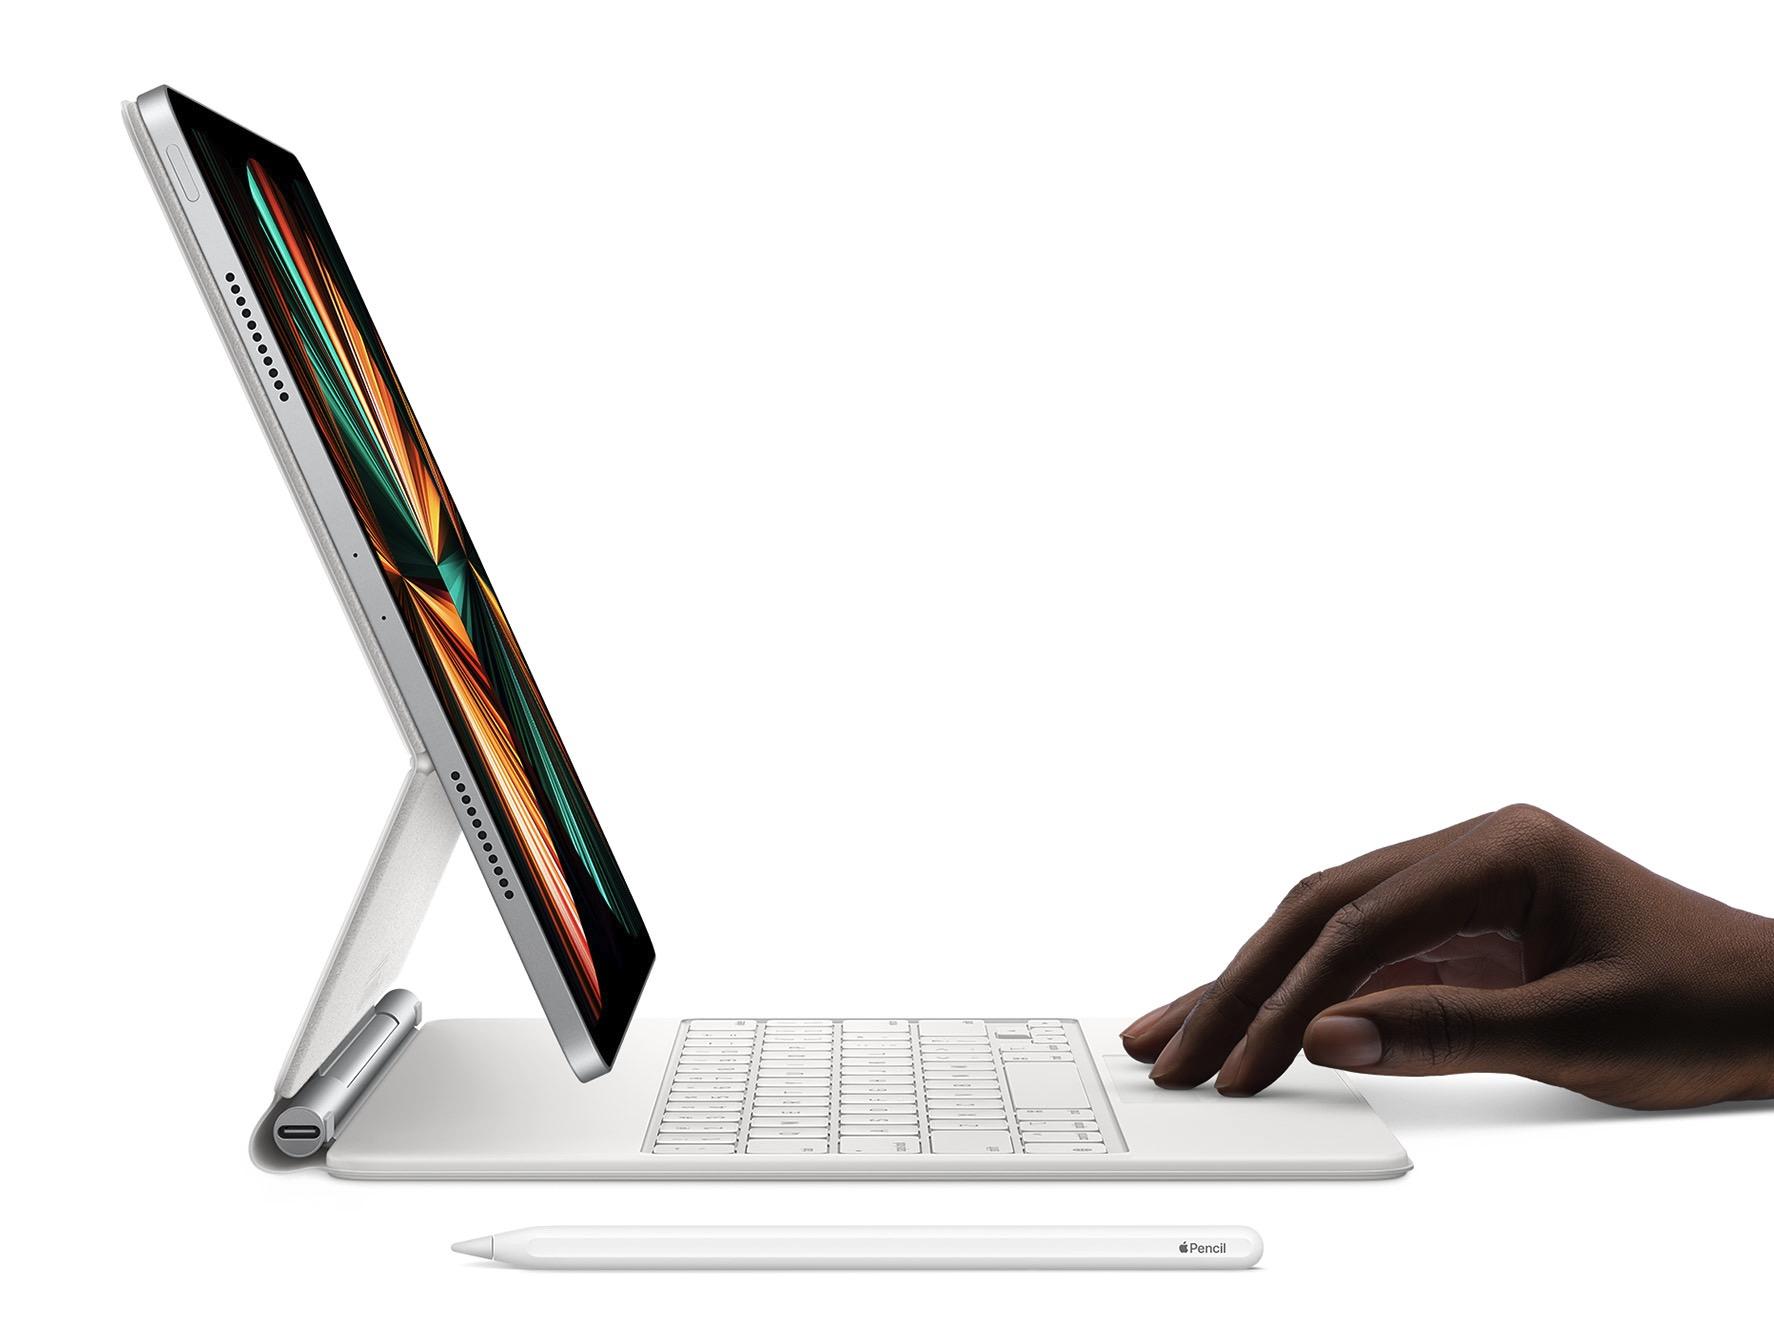 iPad Pro M1